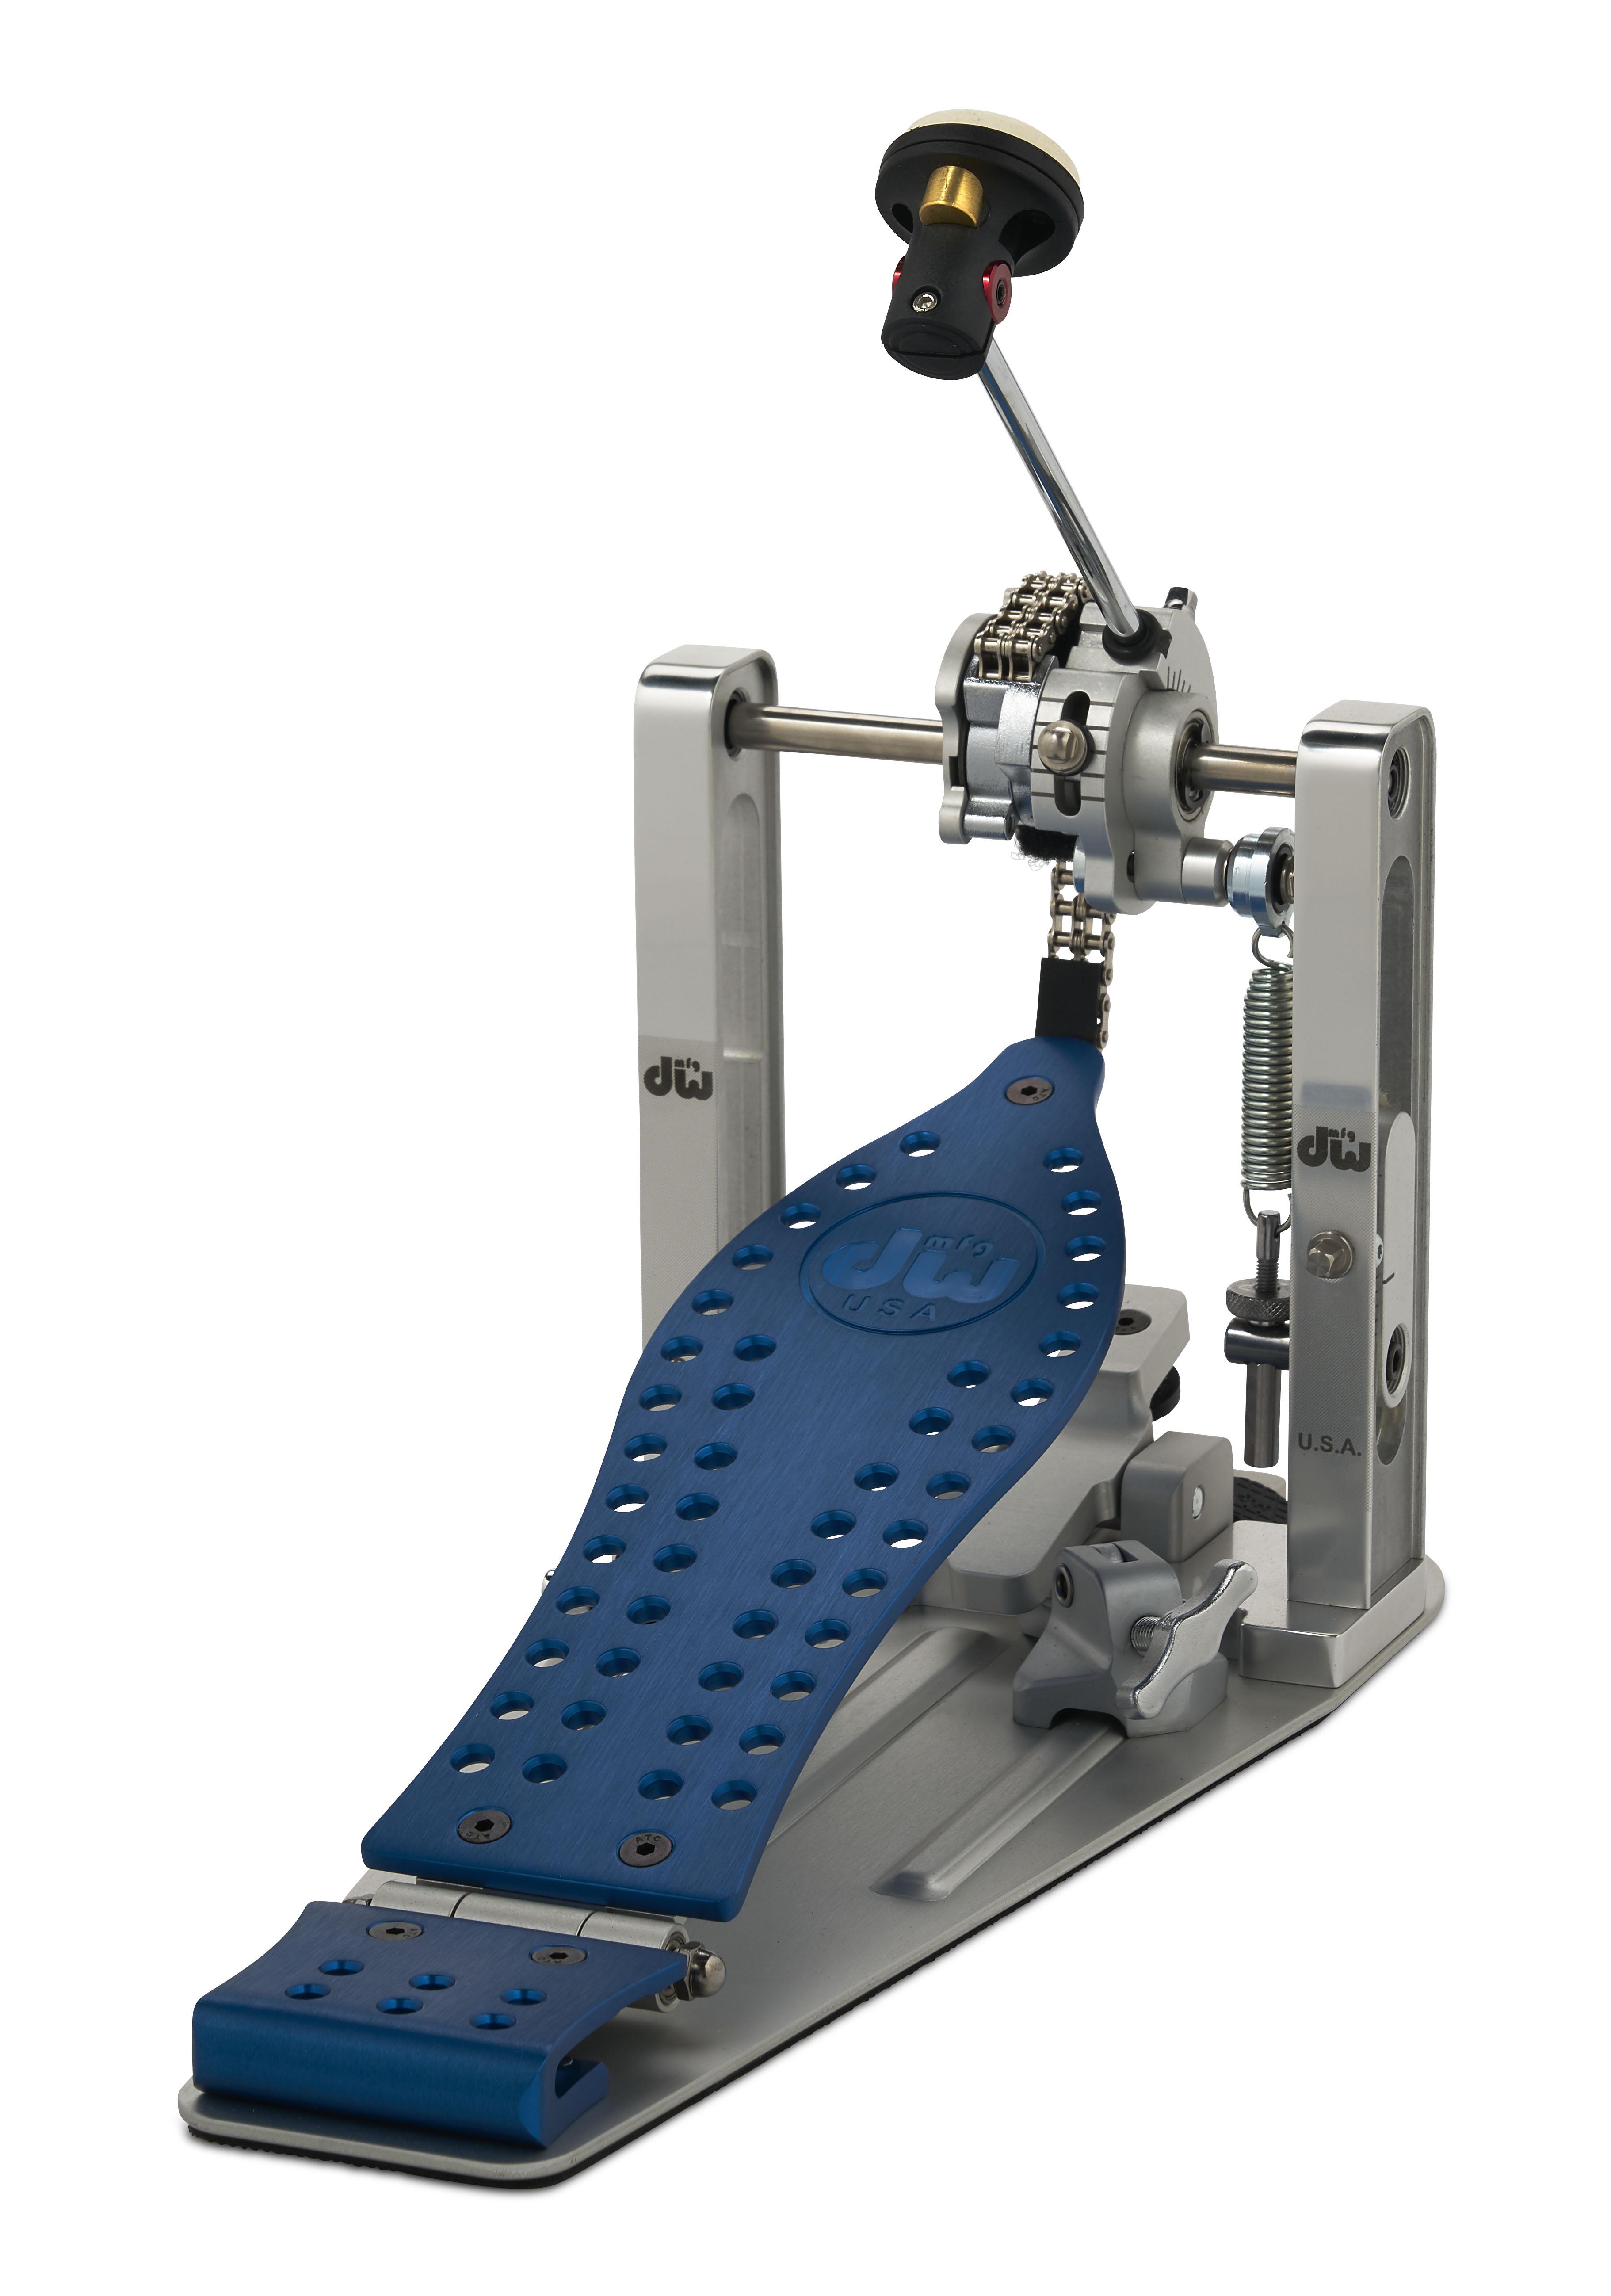 DW MFG Series Machined Chain Drive Single Pedal w/ Bag Blue Edition